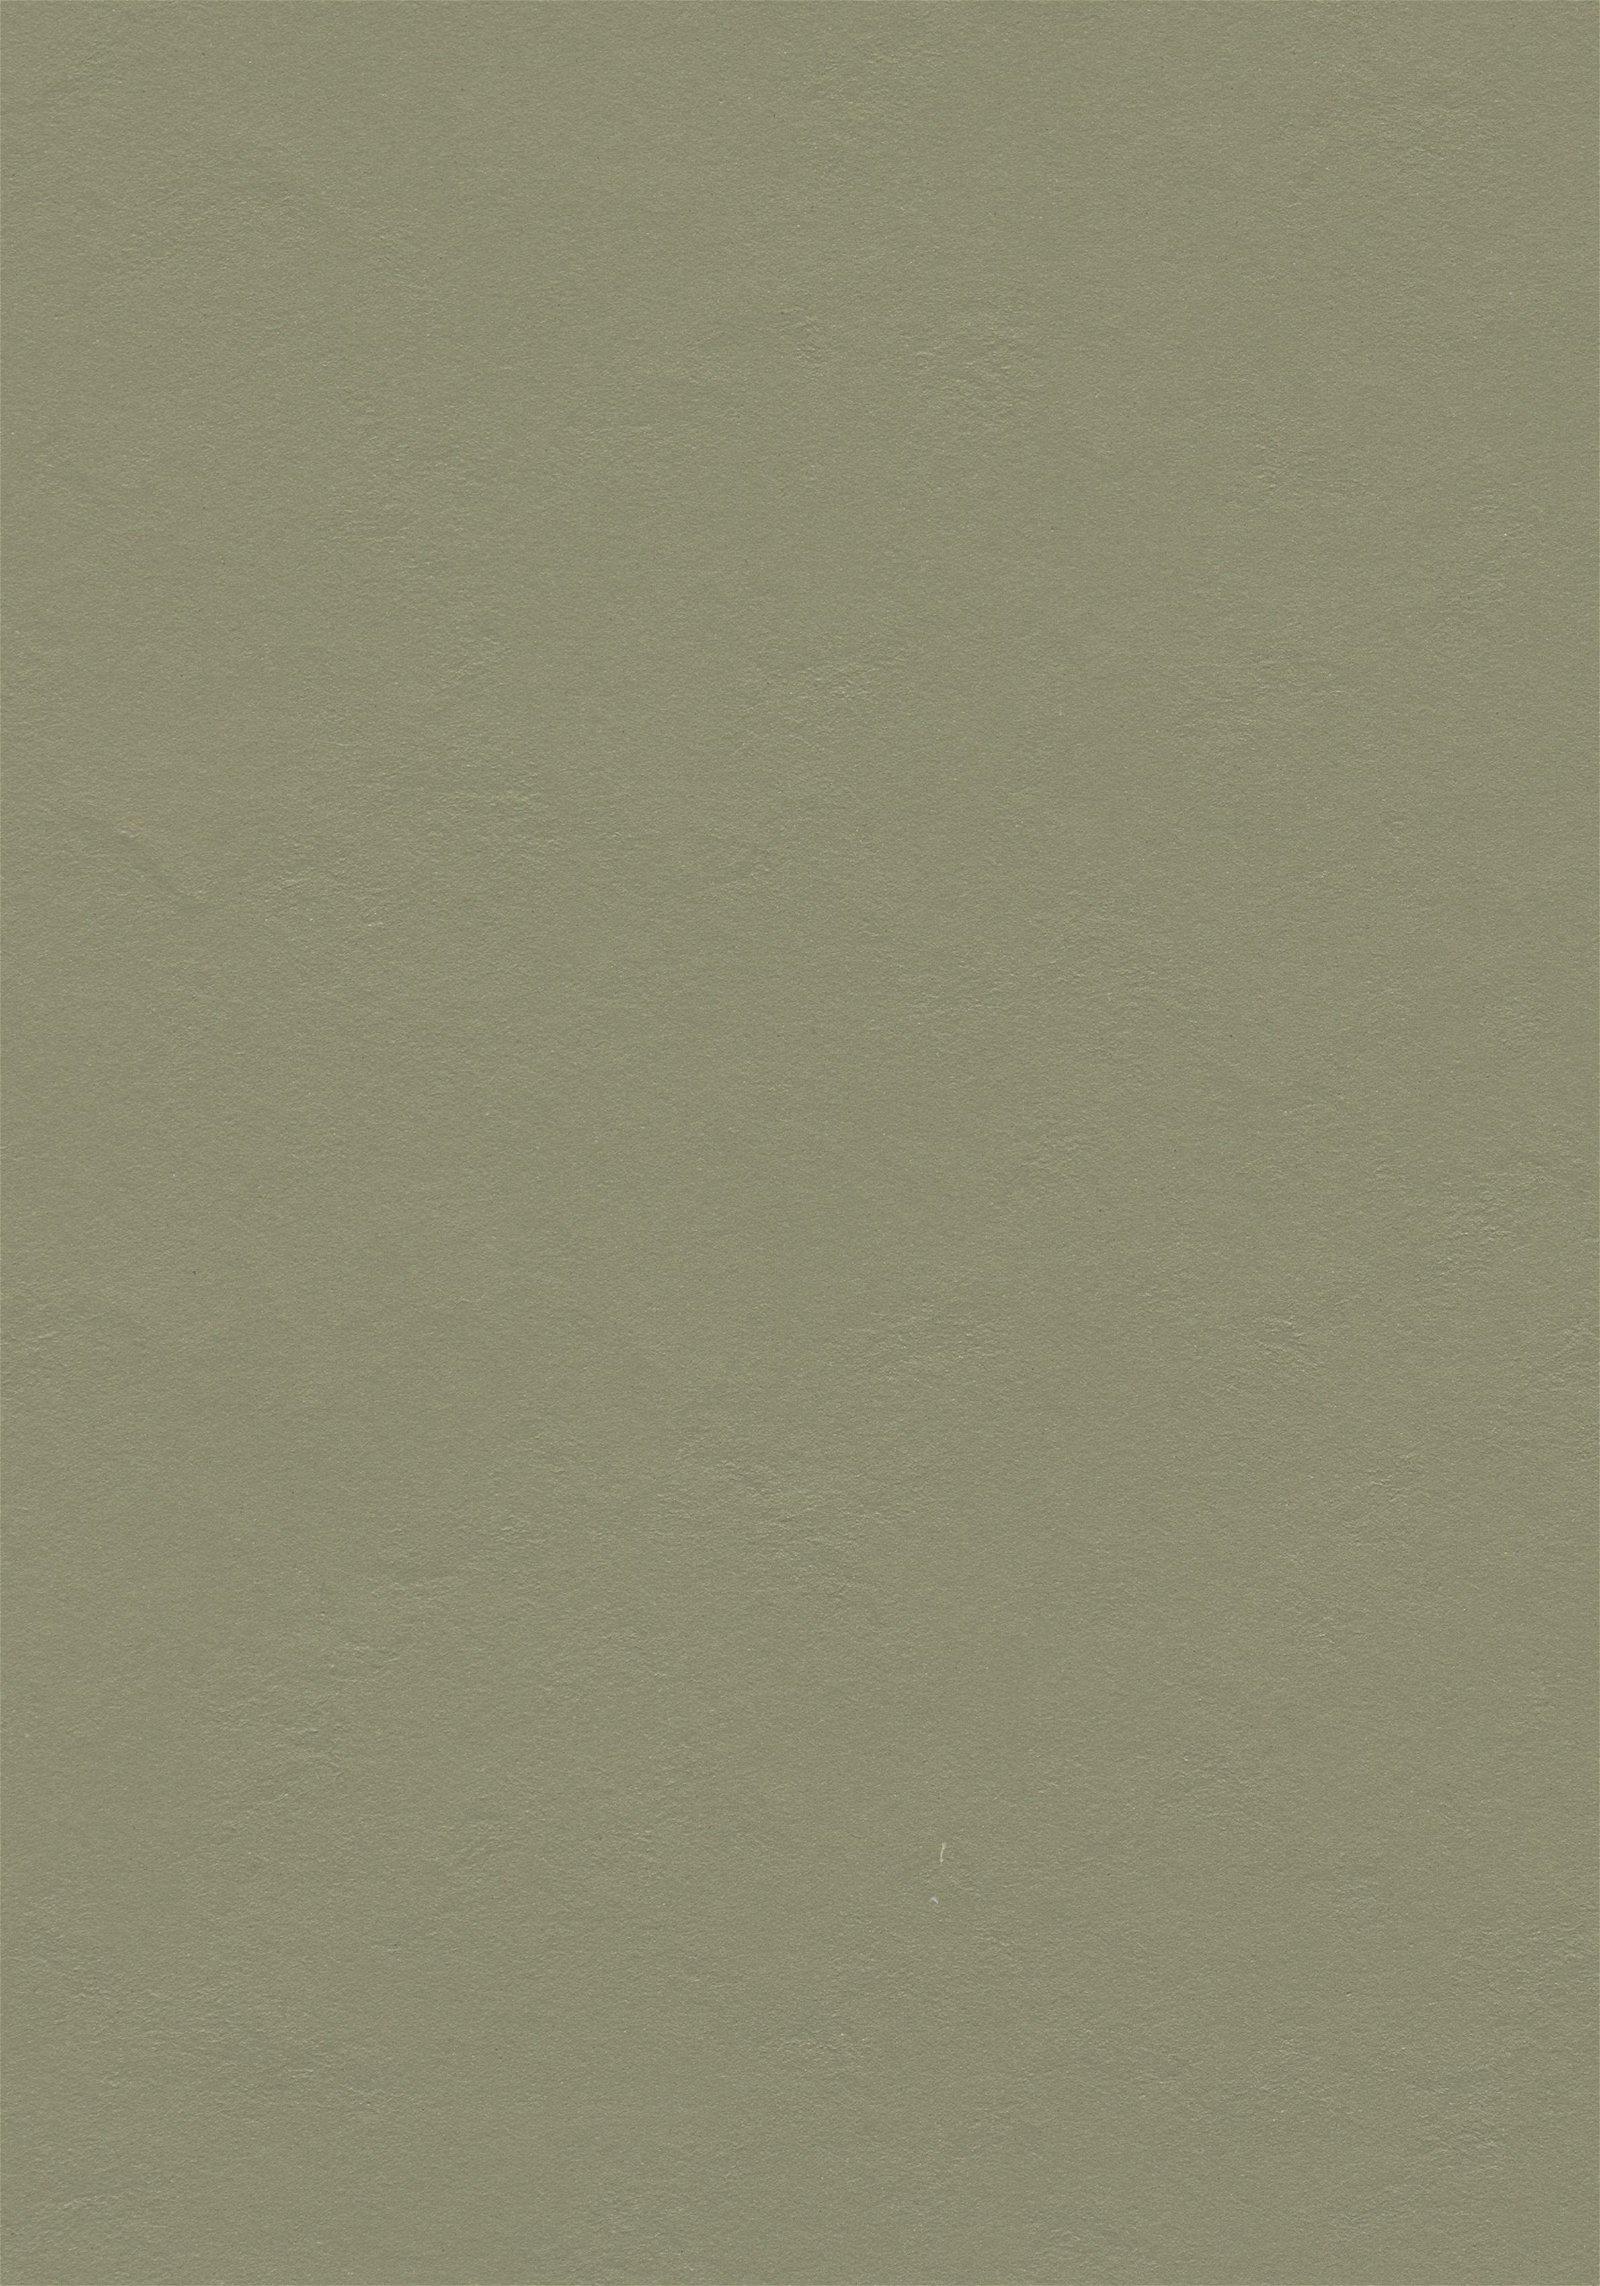 333355 Marmoleum Click Square Rosemary Green